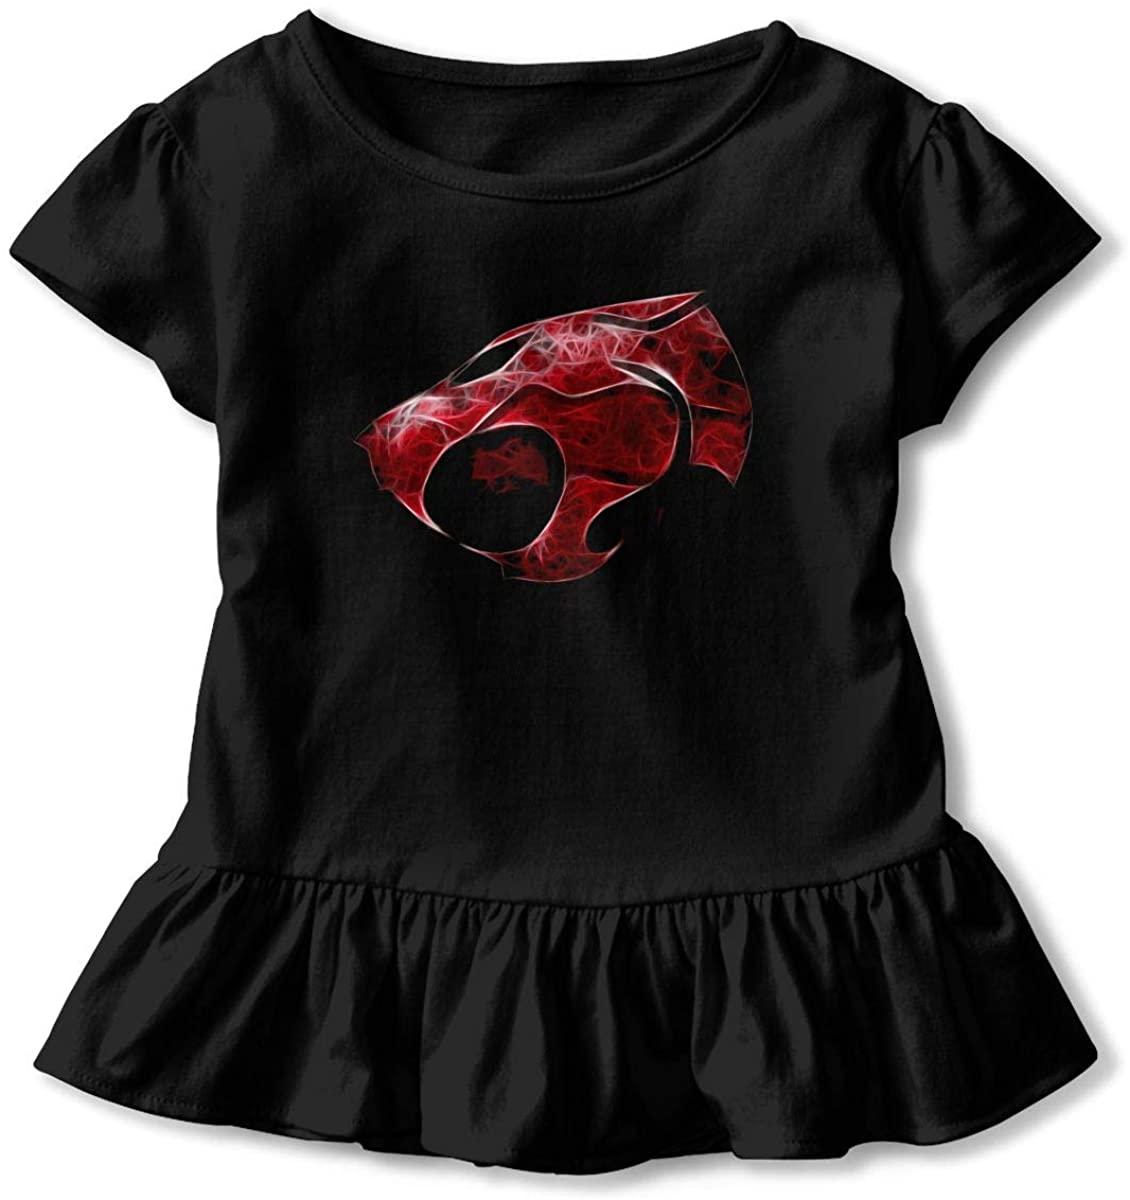 Narukrstore Thundercats Animated Series Toddler Girls' Short-Sleeve Shirts Ruffled T-Shirt Cotton Basic Tee